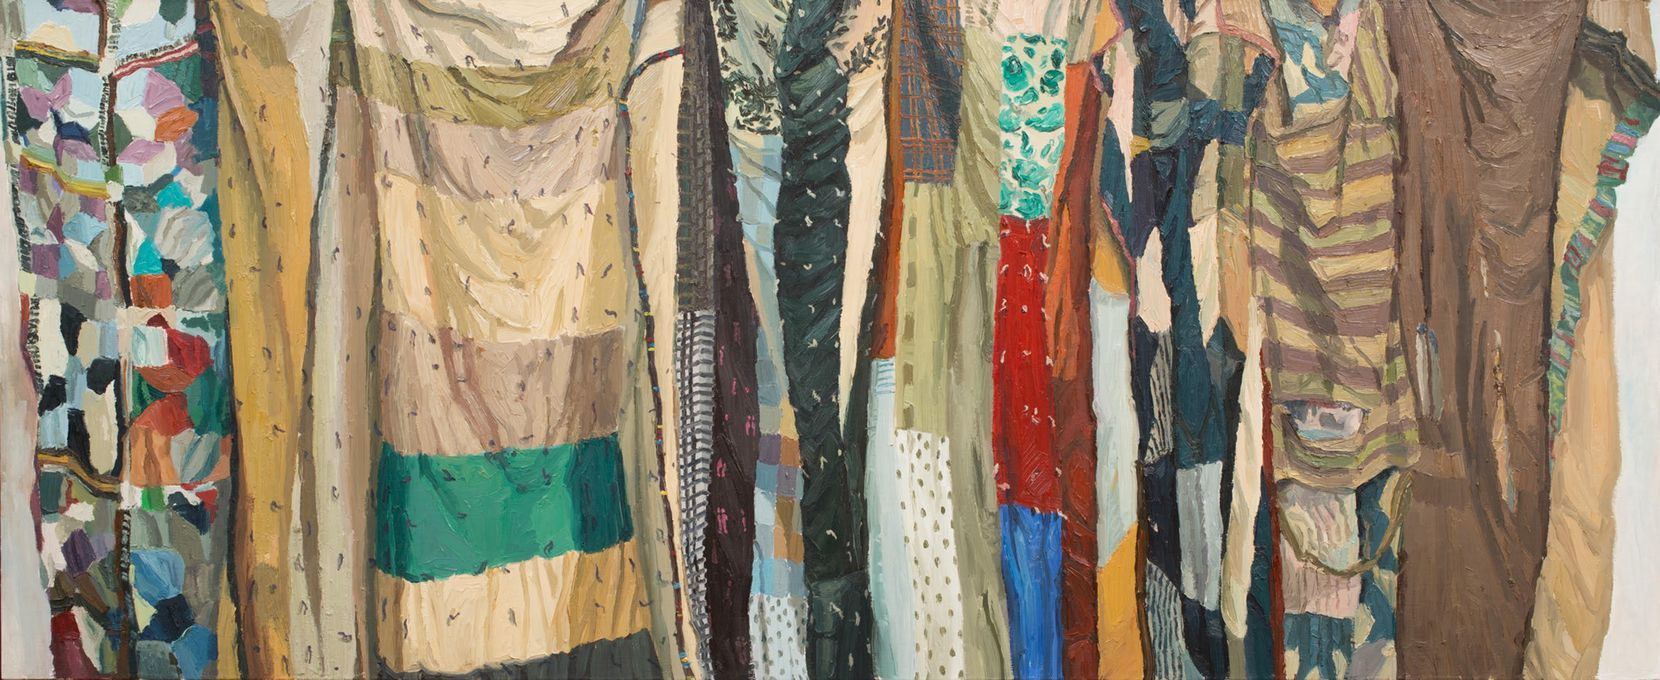 Sedrick Huckaby, Fall Quilts, 2000's